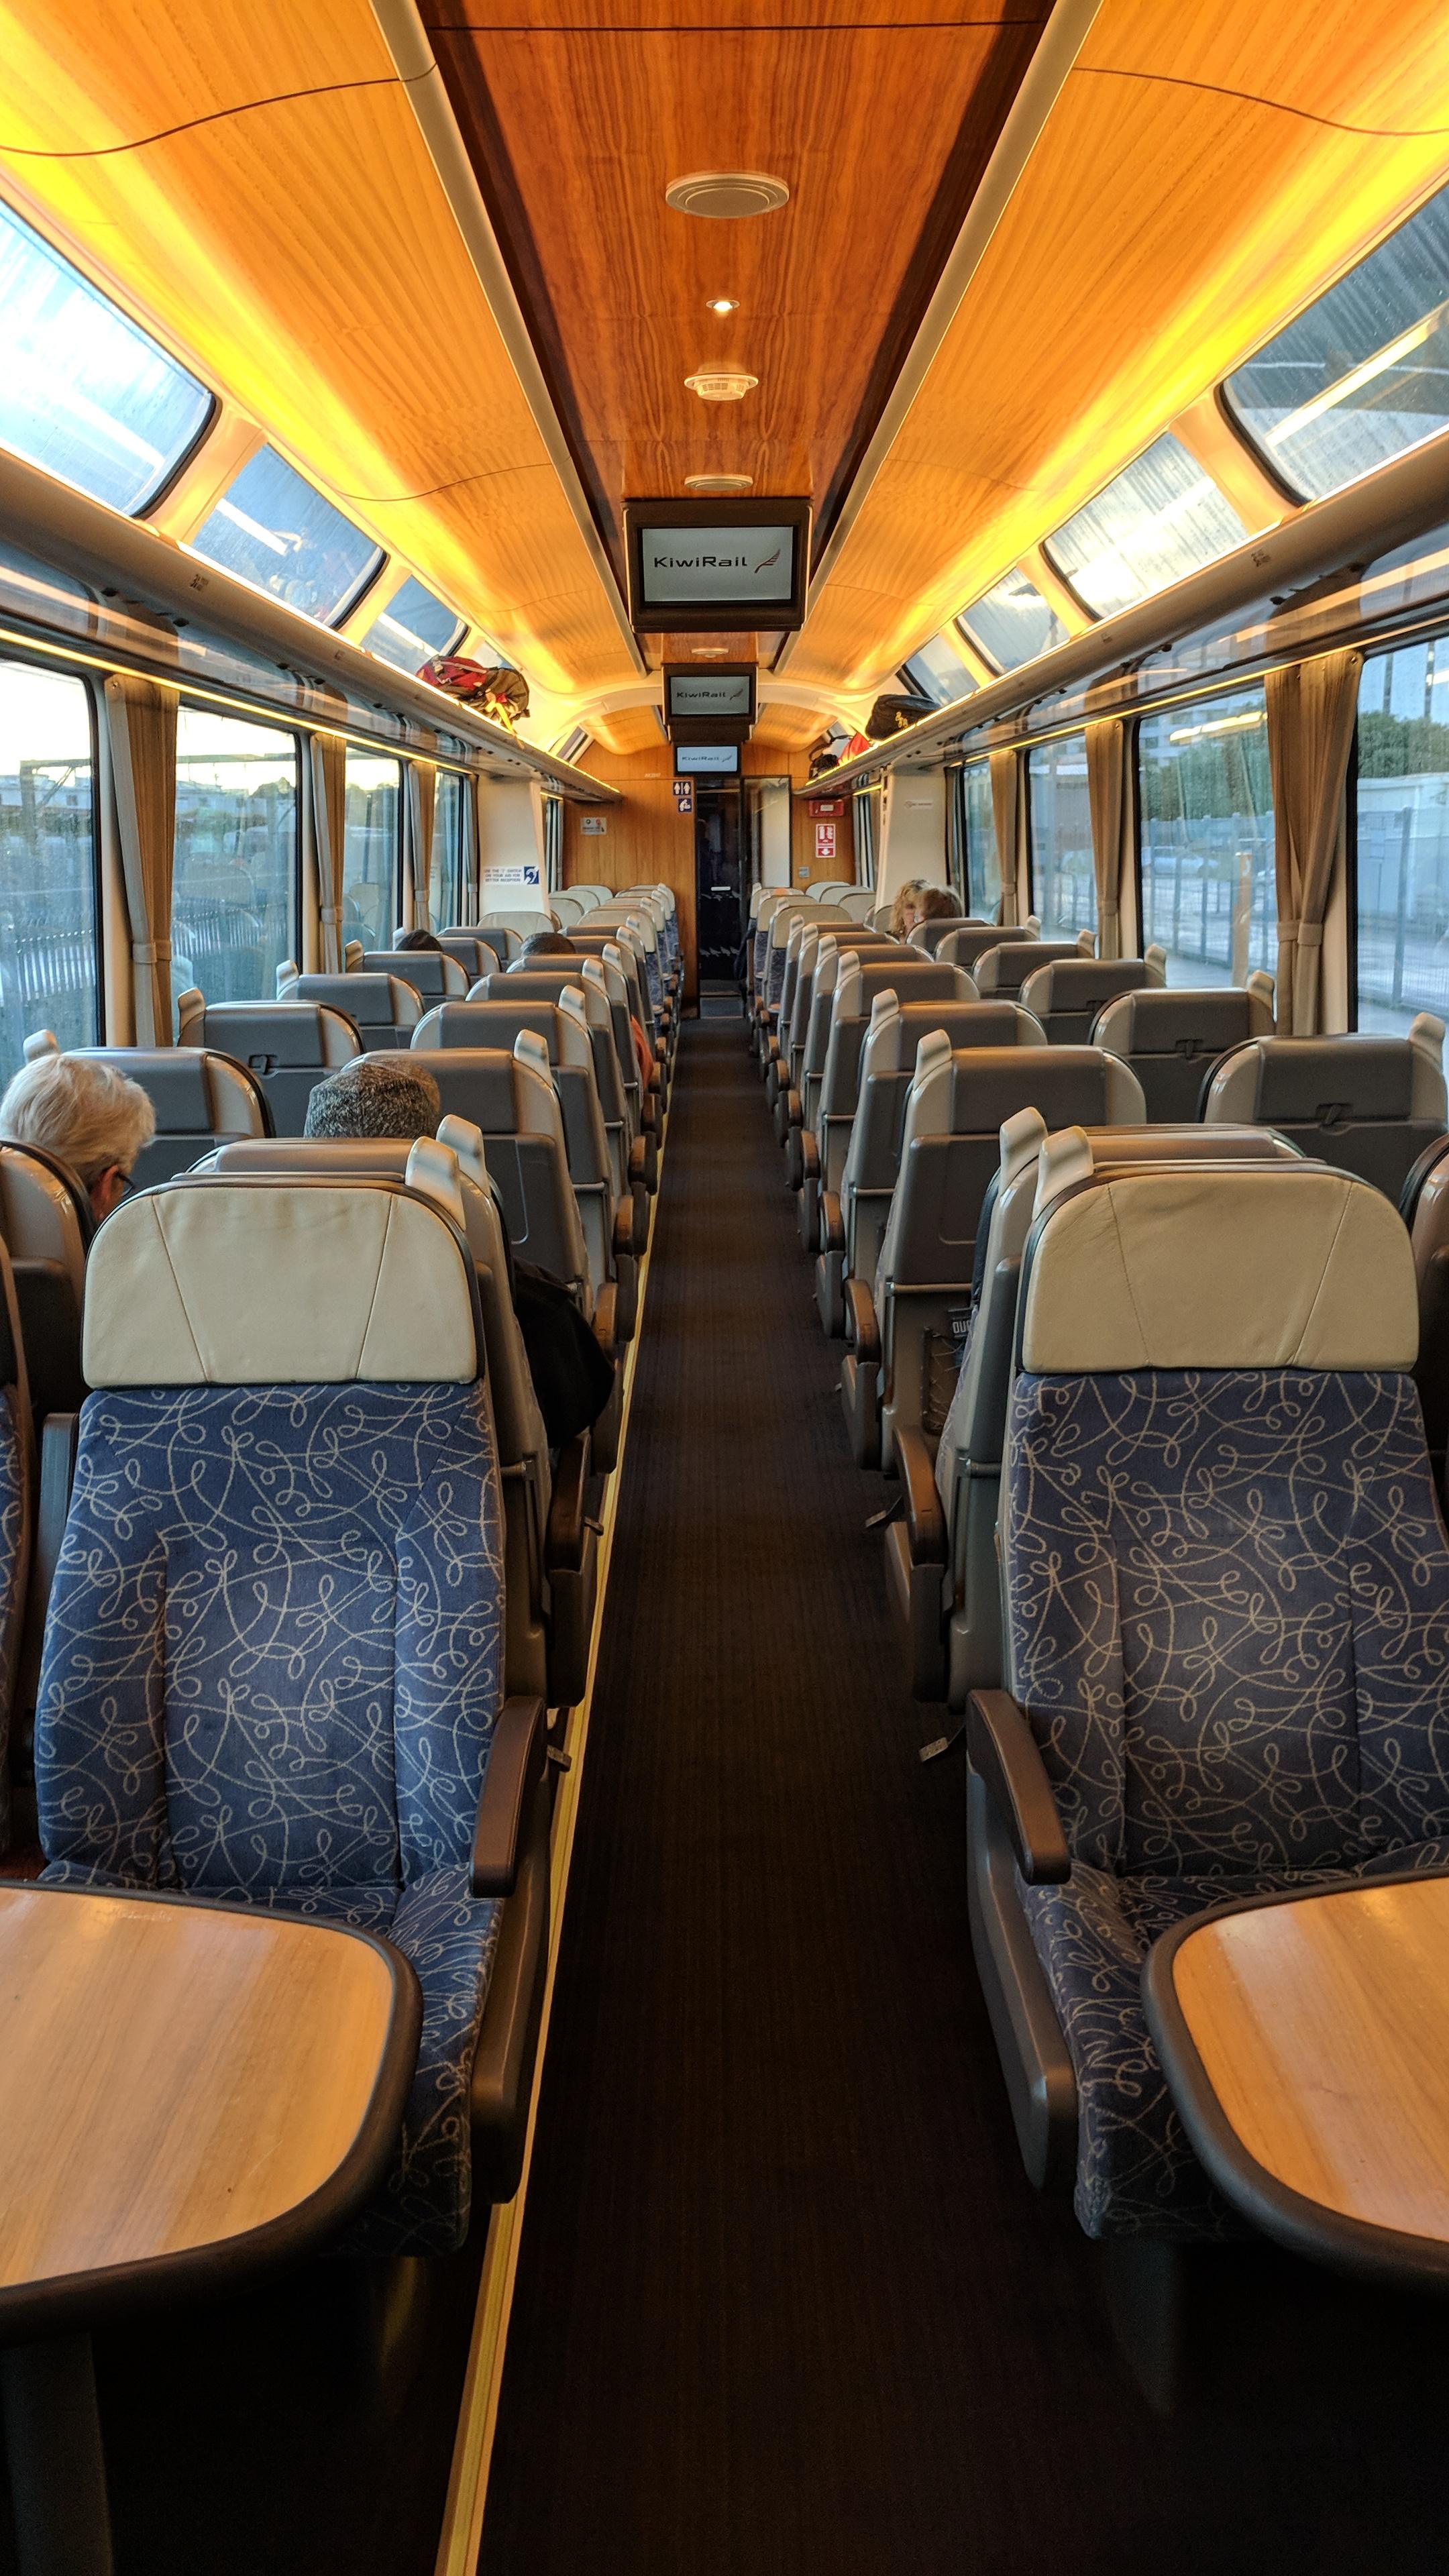 AoNZ Northern Explorer scenic train, passenger carriage